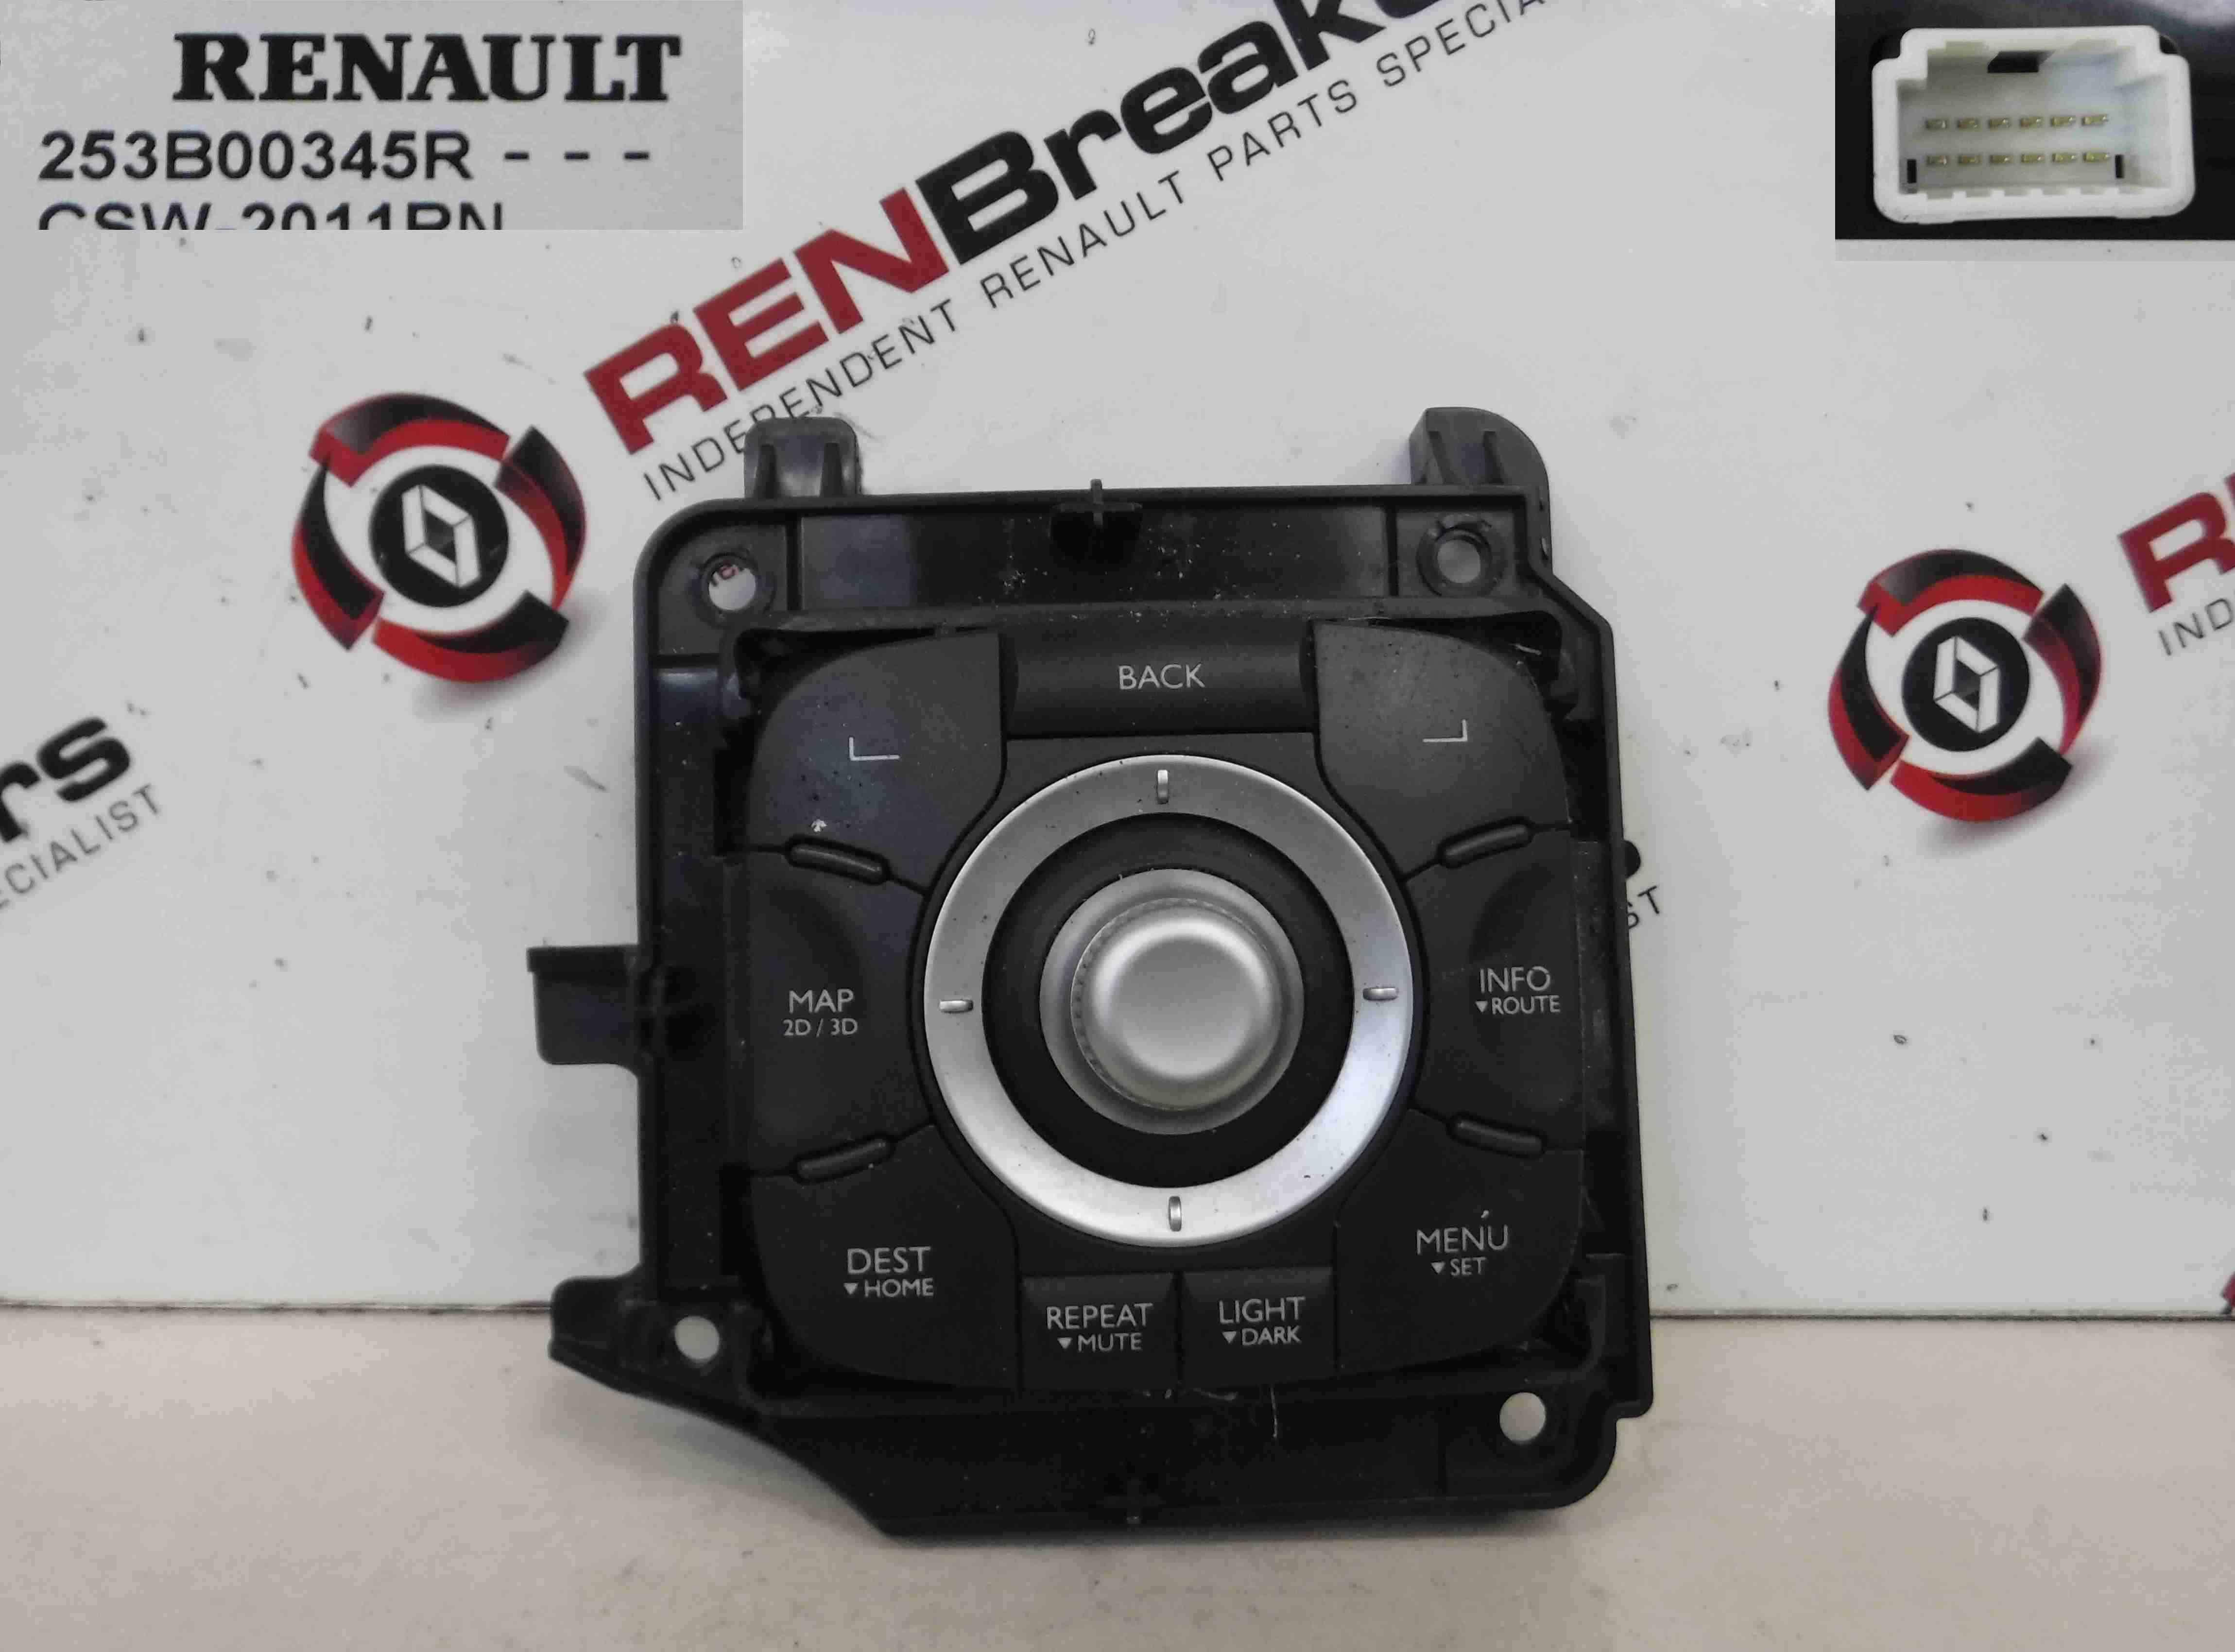 Renault Megane + Scenic MK3 2008-2014 Multi Media Centre Control Unit 253B00345R